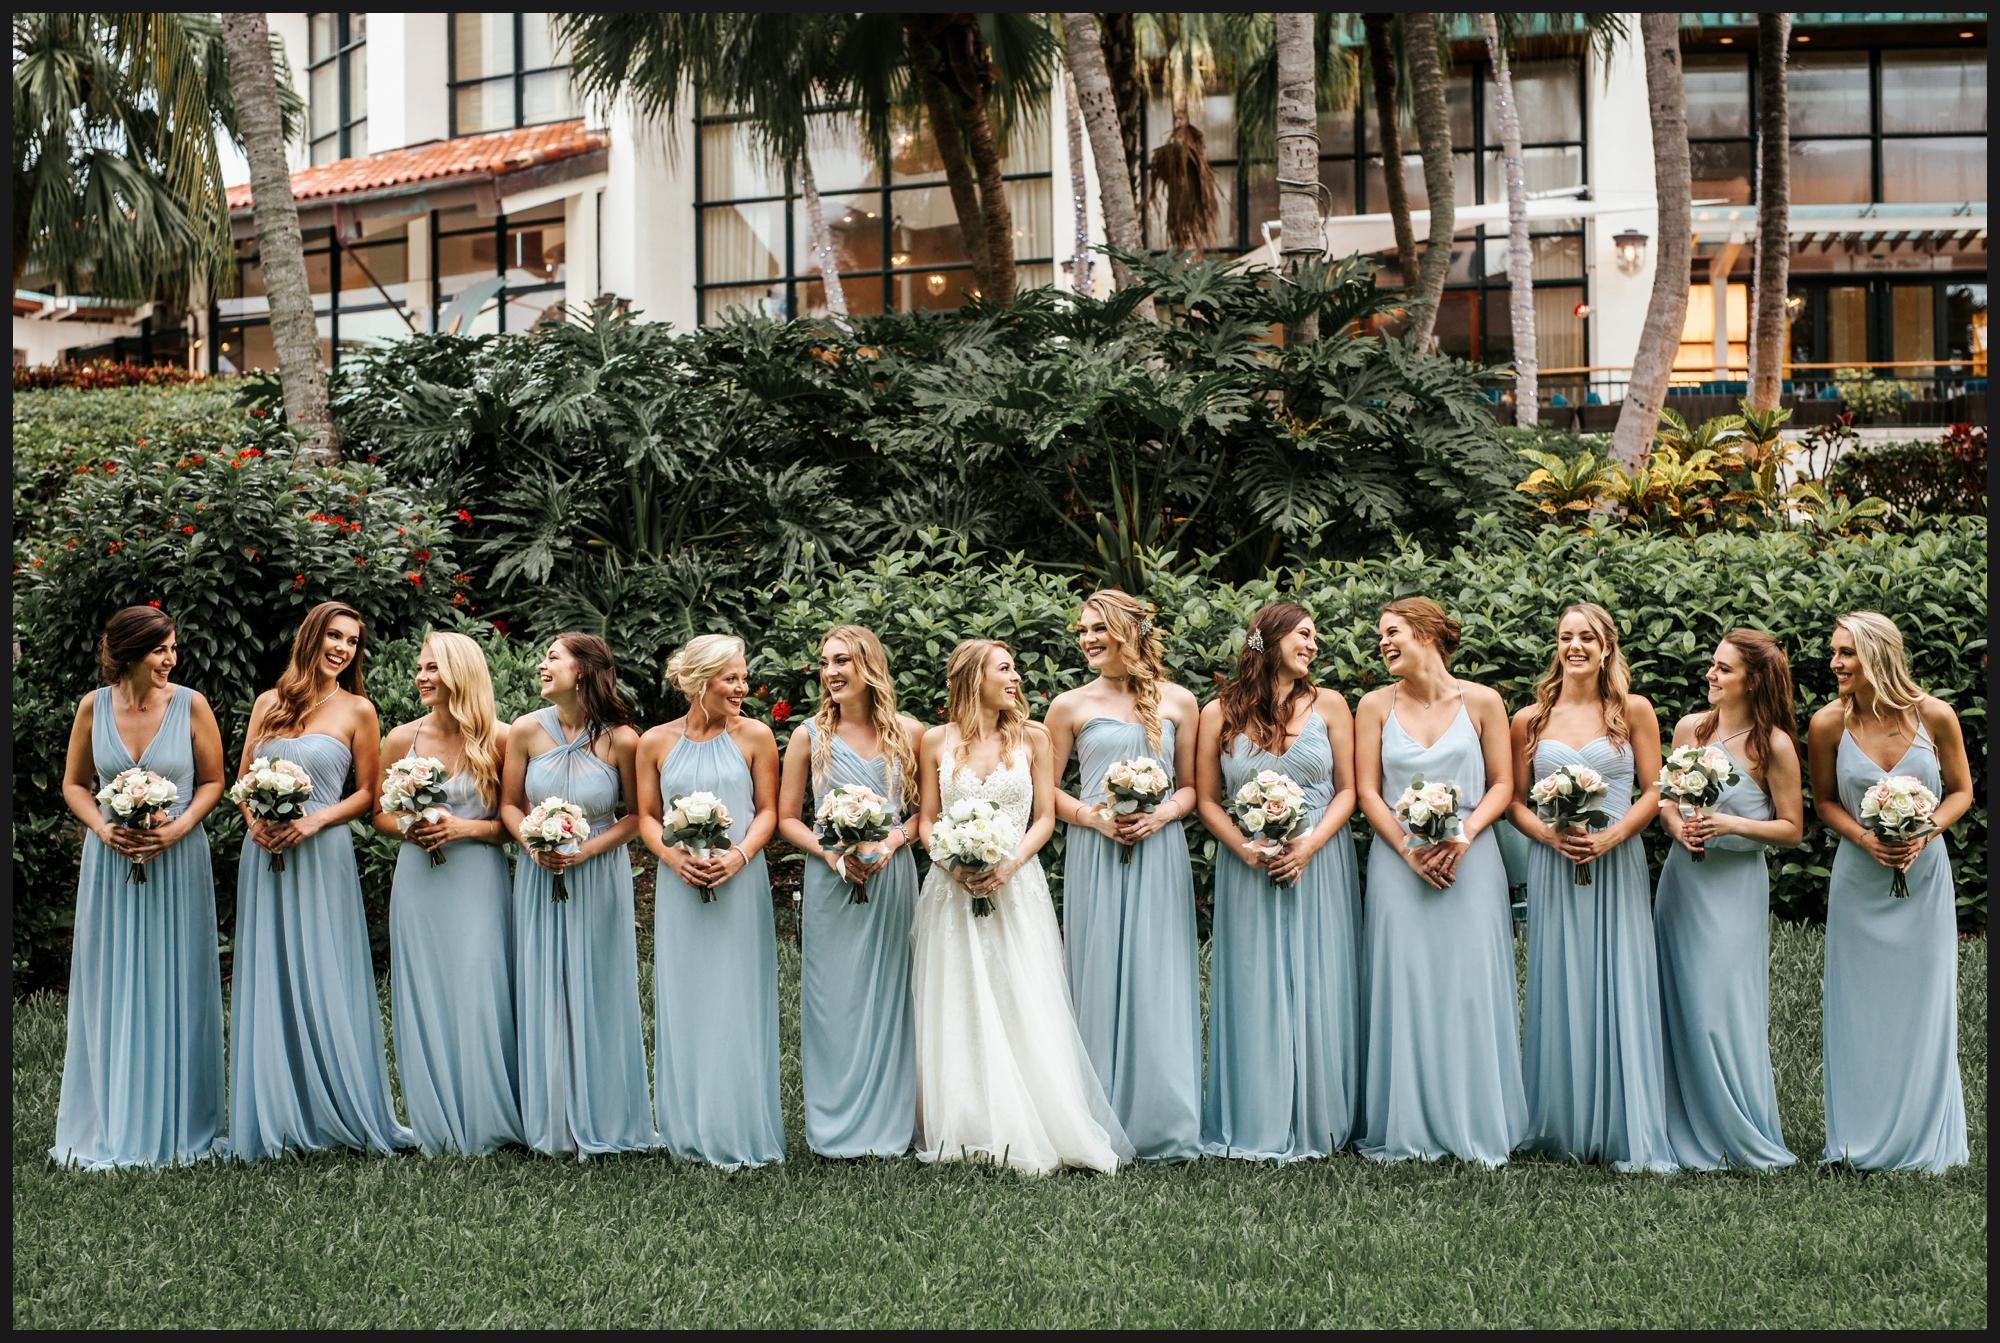 Orlando-Wedding-Photographer-destination-wedding-photographer-florida-wedding-photographer-bohemian-wedding-photographer_0065.jpg